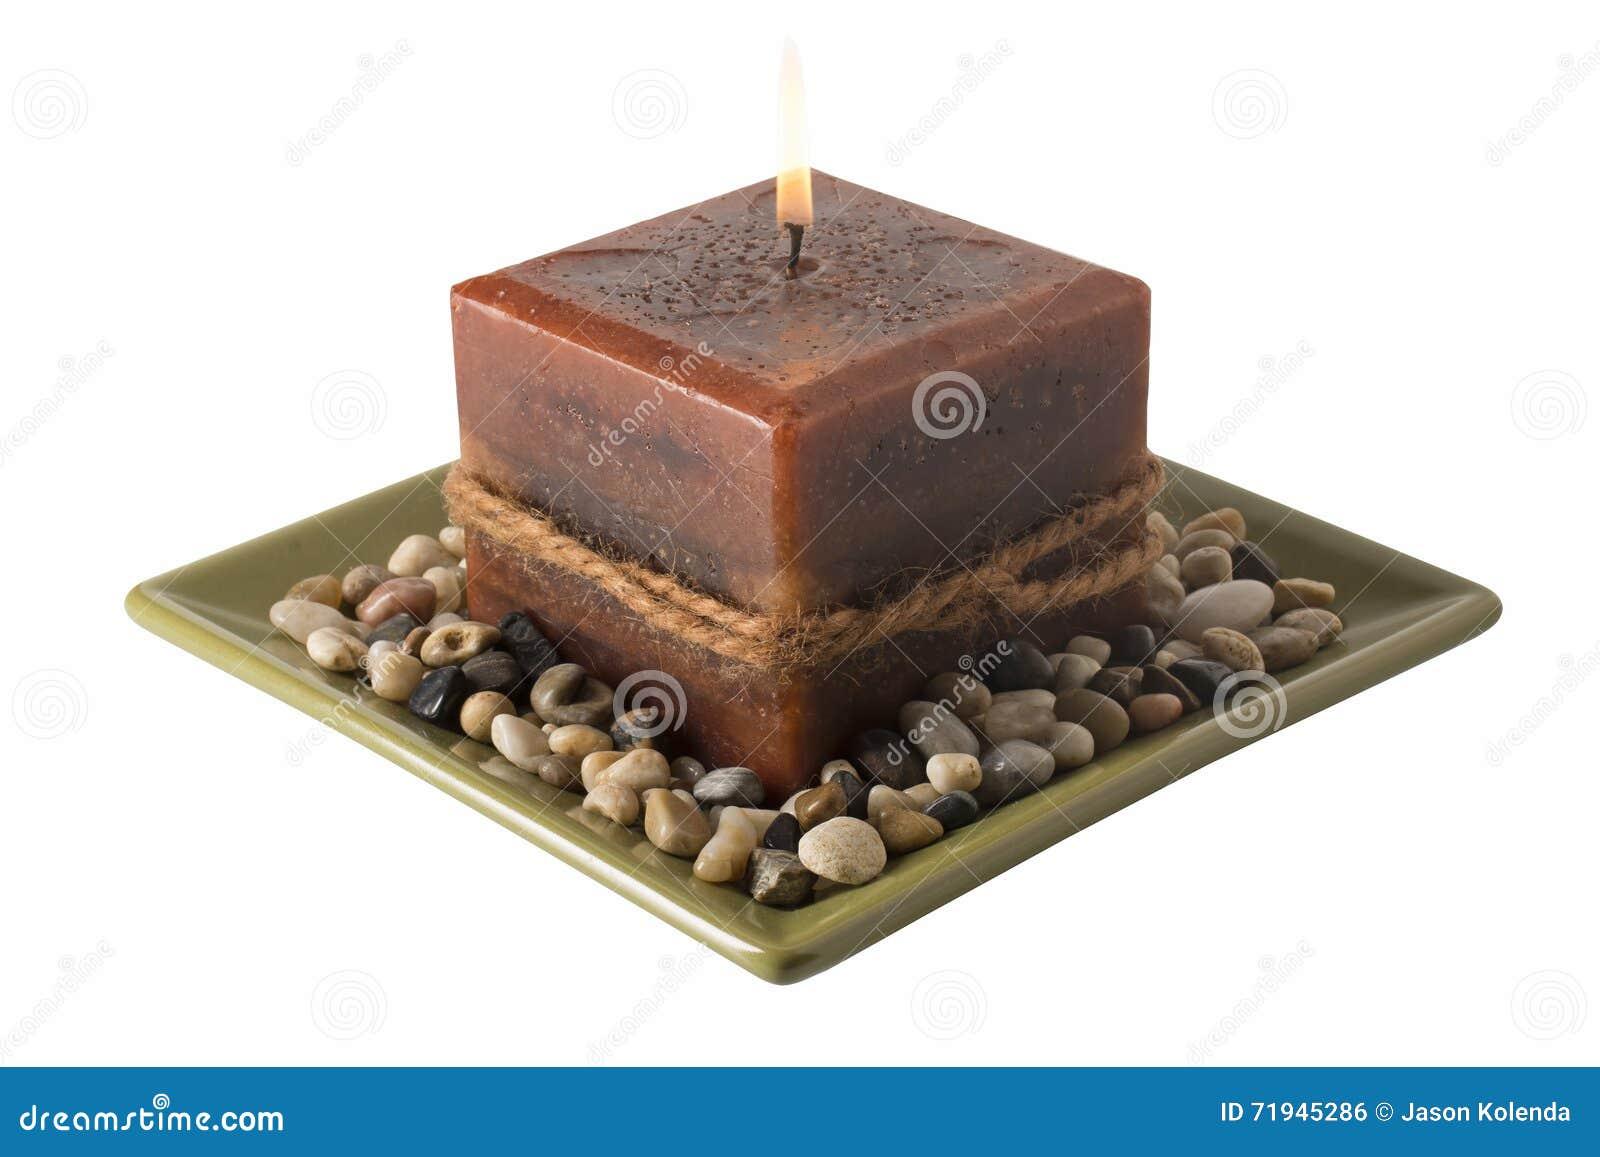 Свеча на плите при освещенные камни -